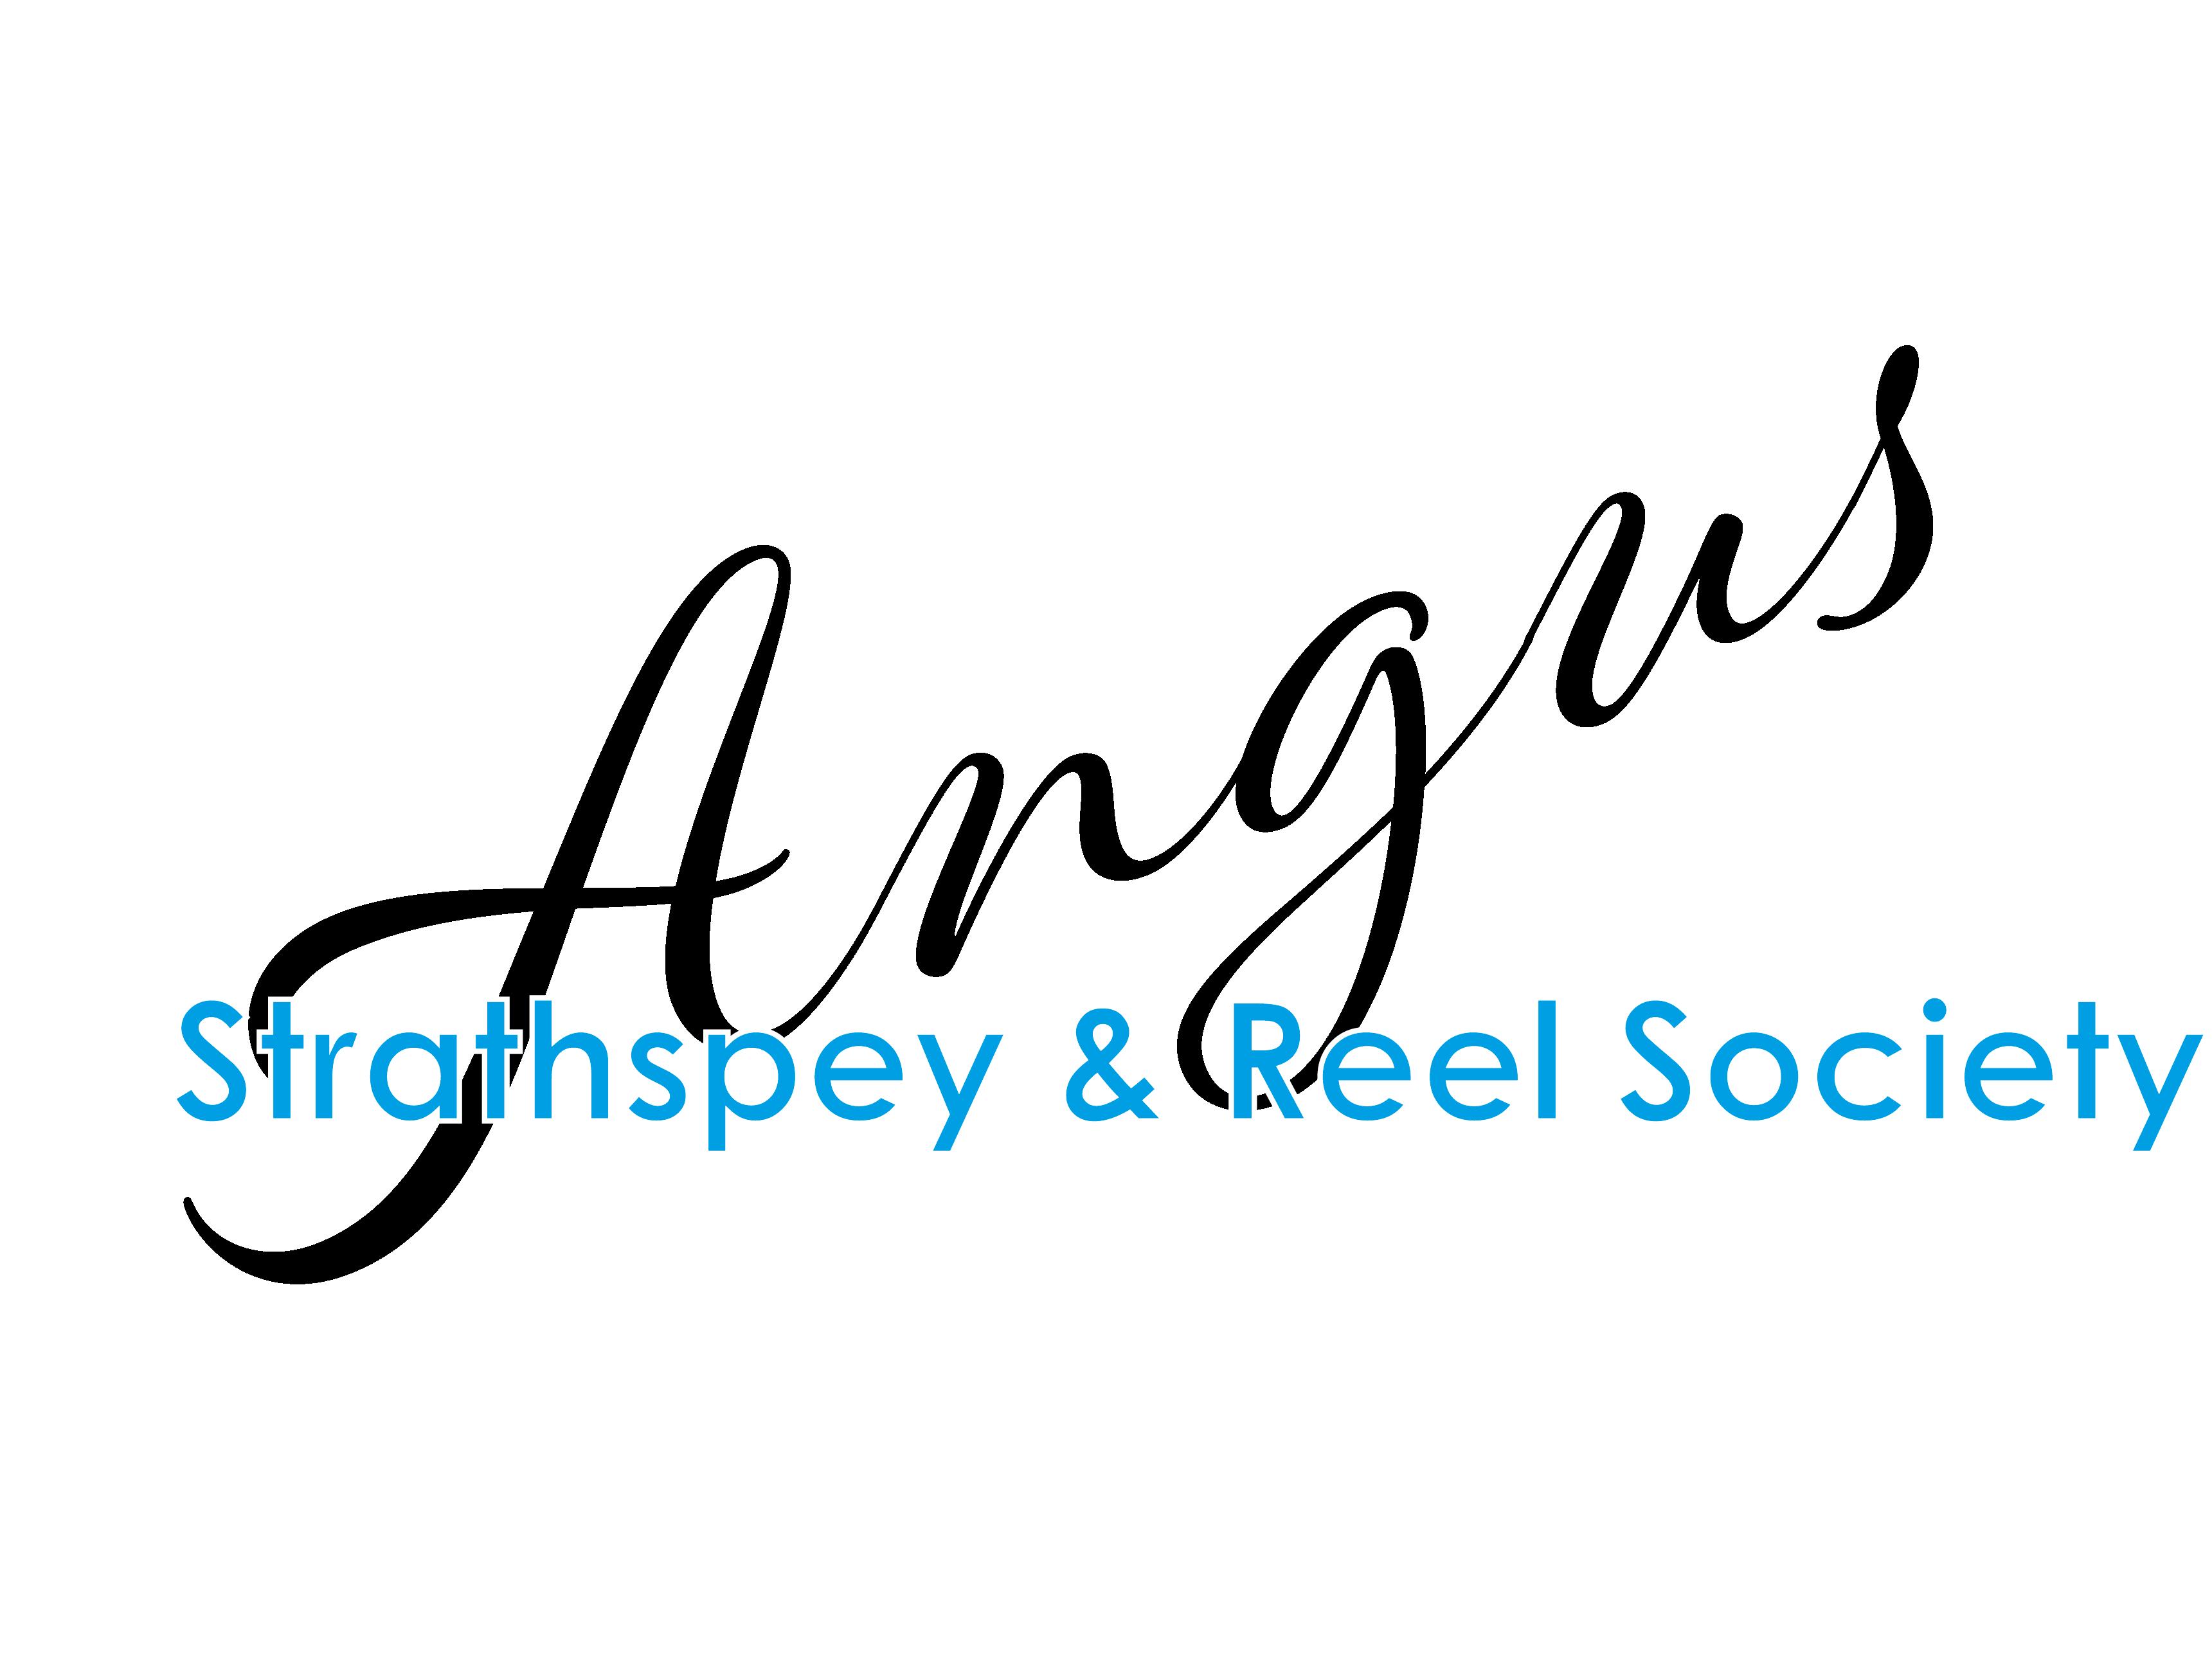 Angus Strathspey & Reel Society